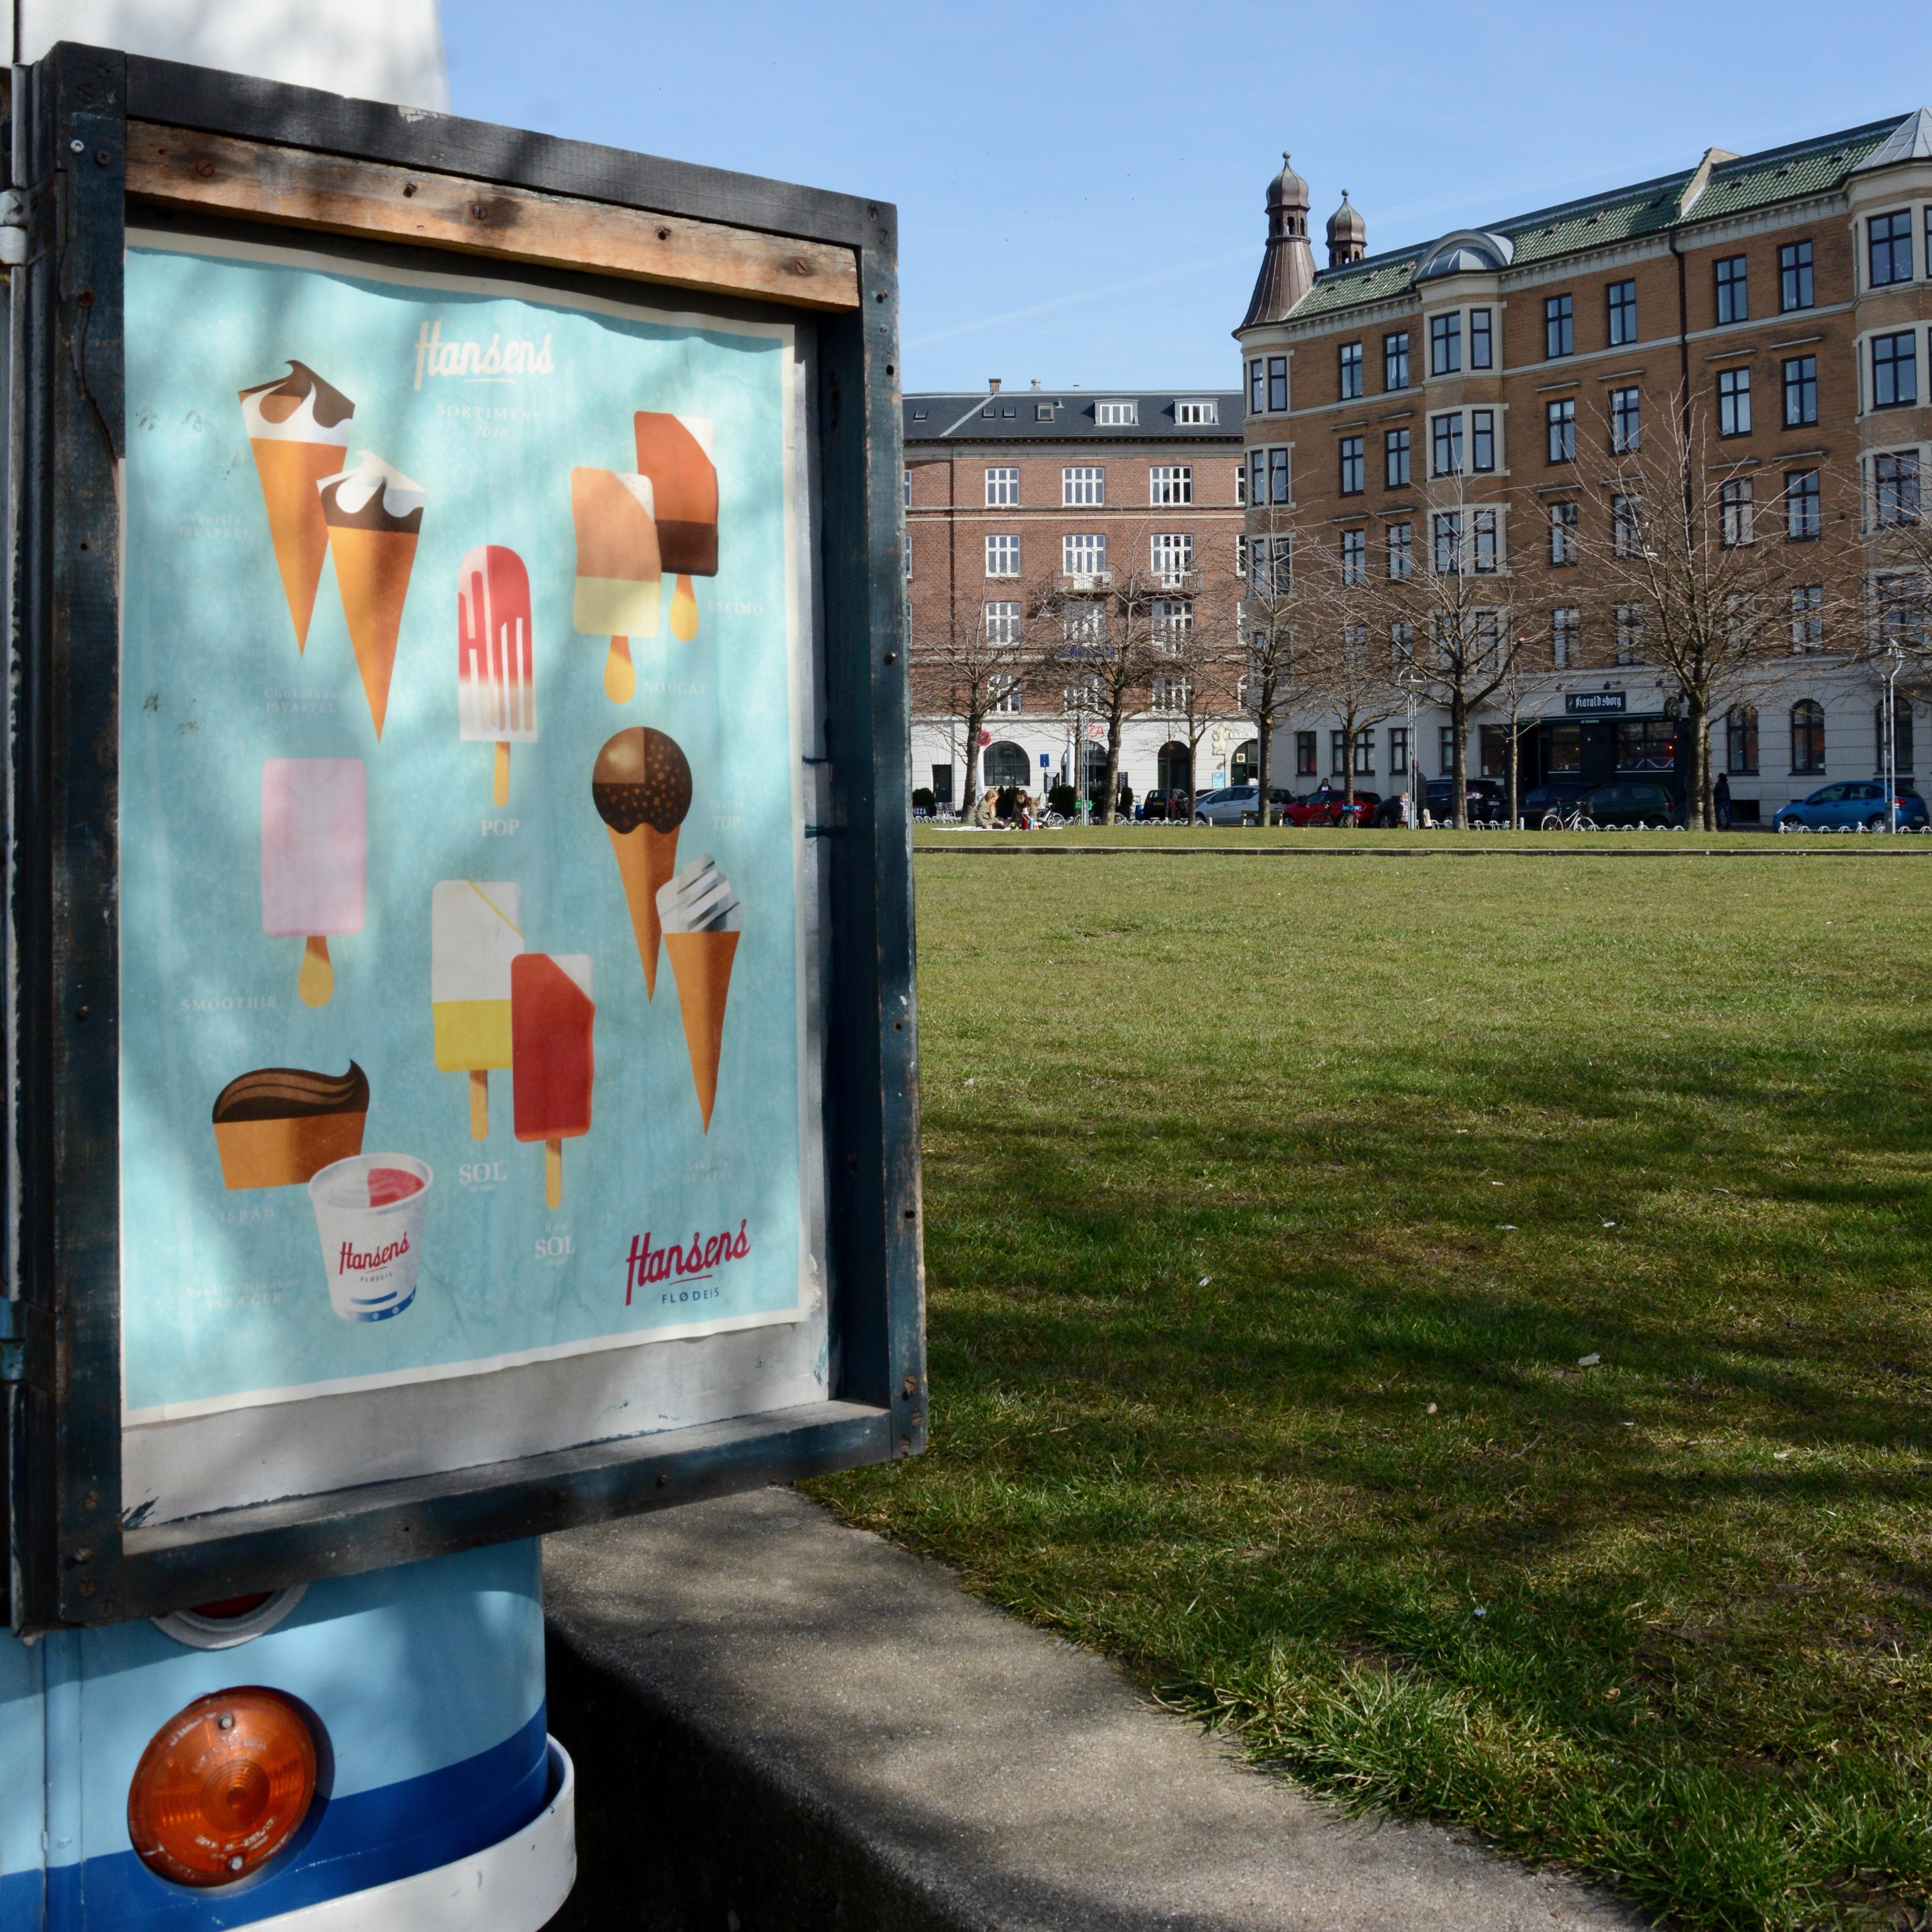 travel with kids children Copenhagen Denmark christianshavn ice cream van